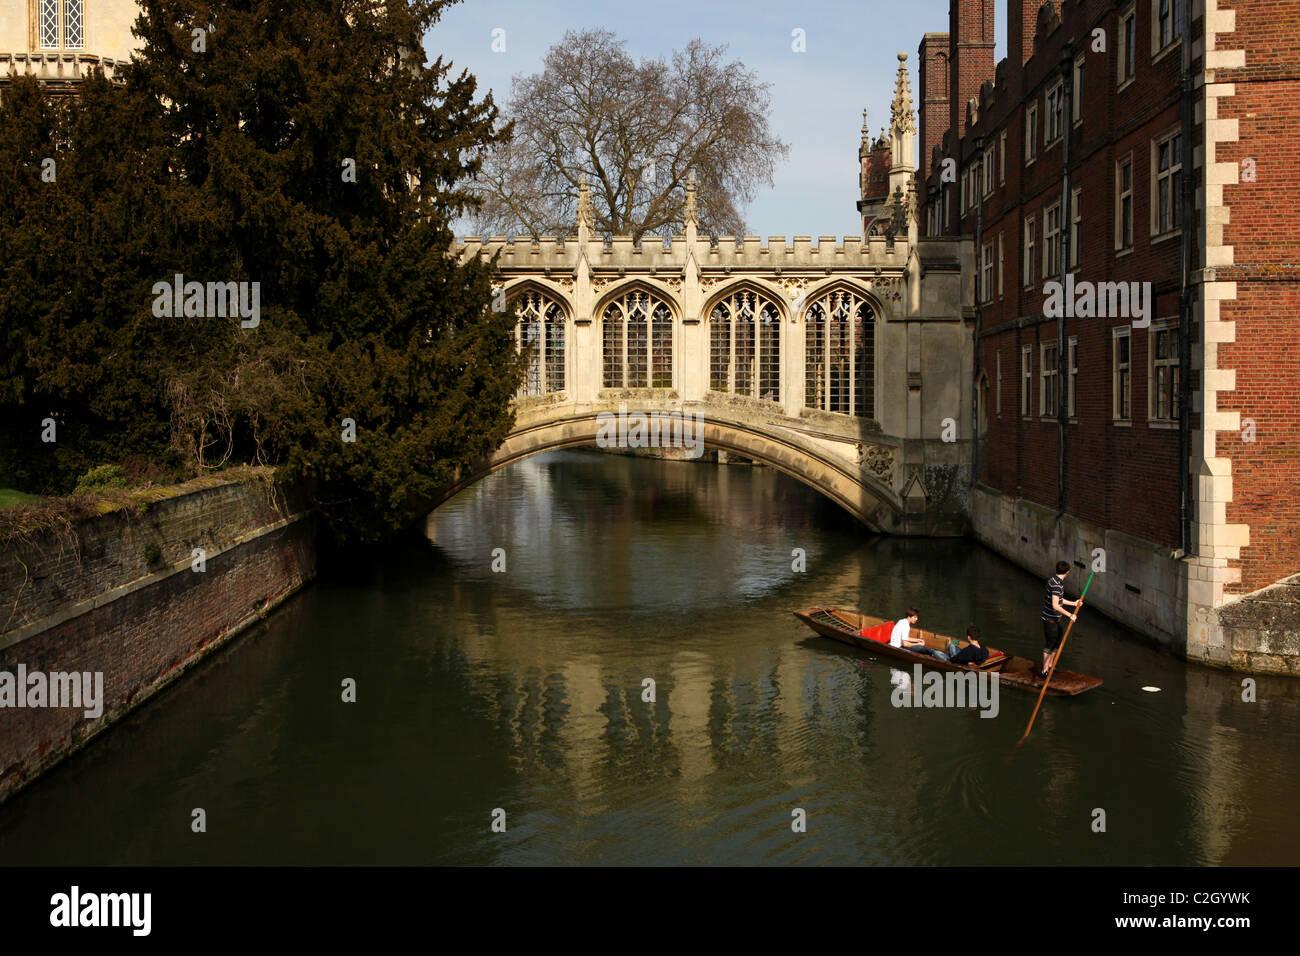 Punt under the Bridge of Sighs at St. John's College, Cambridge, UK - Stock Image